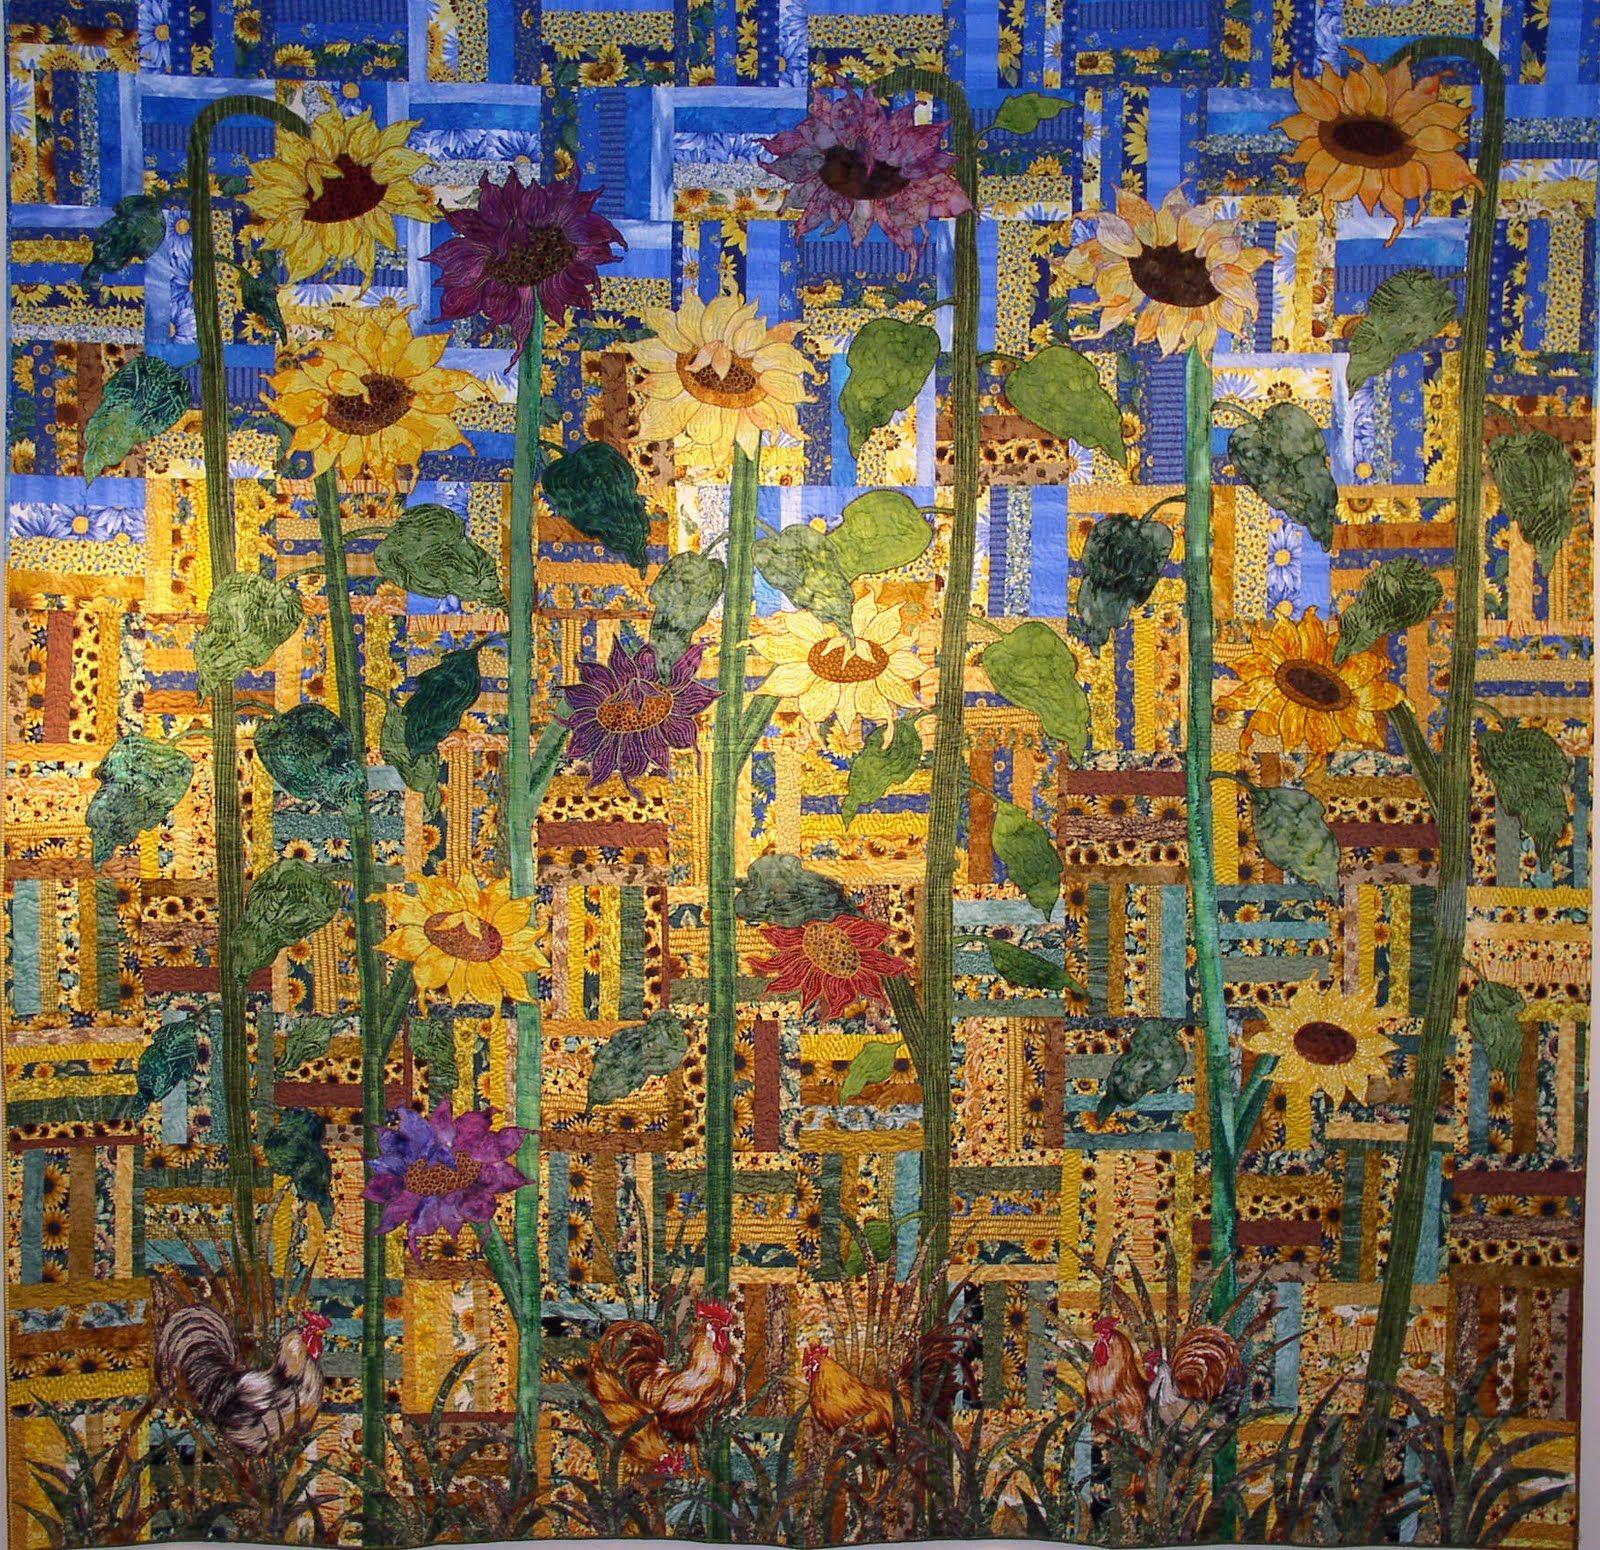 Sunflower Patch The 25 Best Sunflower Quilts Ideas On Pinterest